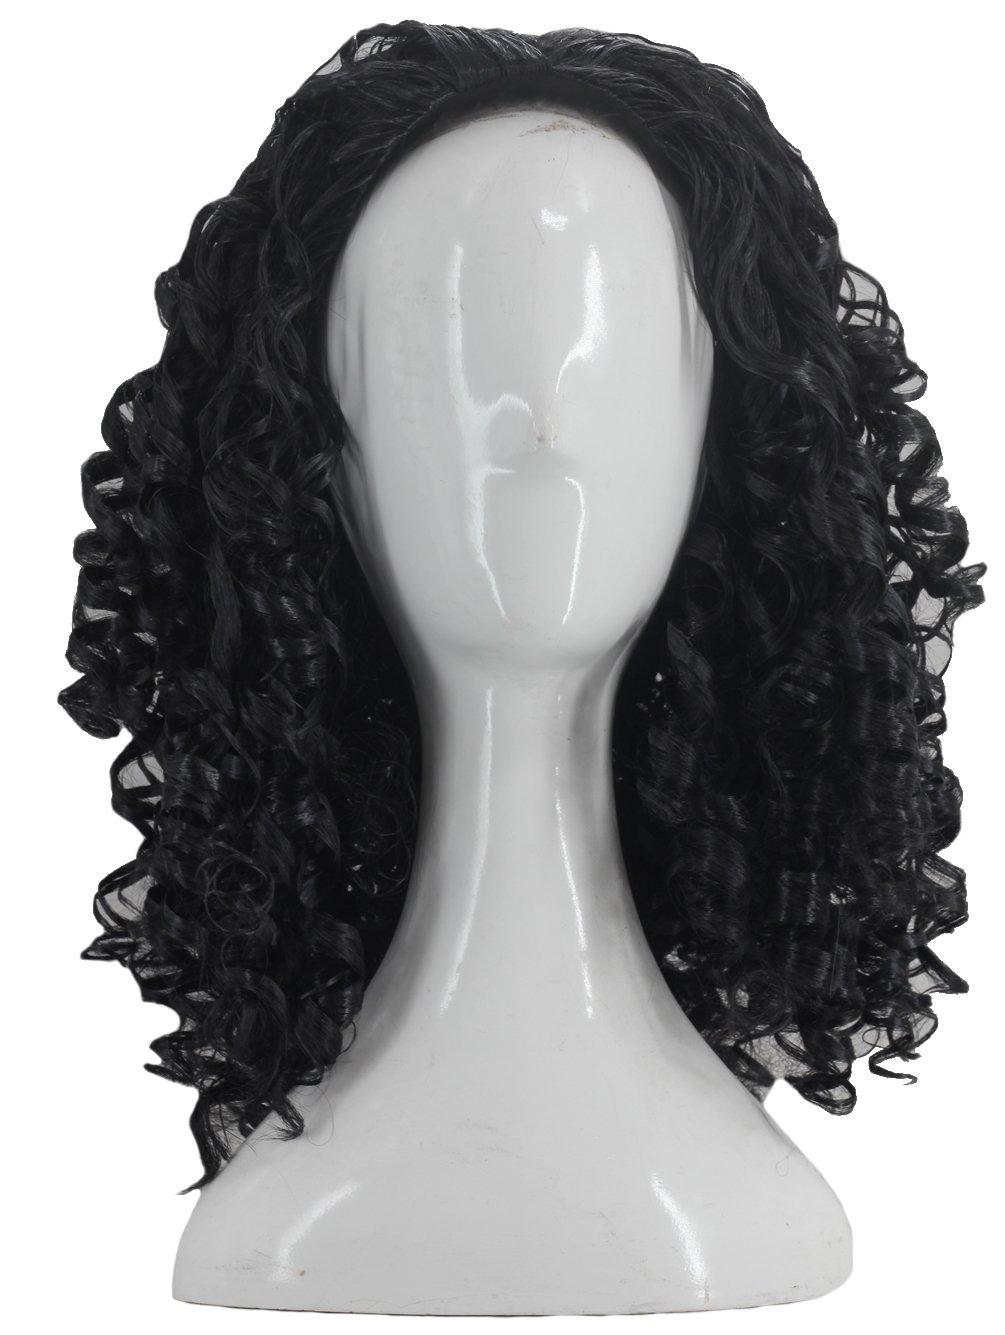 Angelaicos Unisex Wavy Halloween Costume Full Wig Long Dark Brown (Men's Wig) by Angelaicos